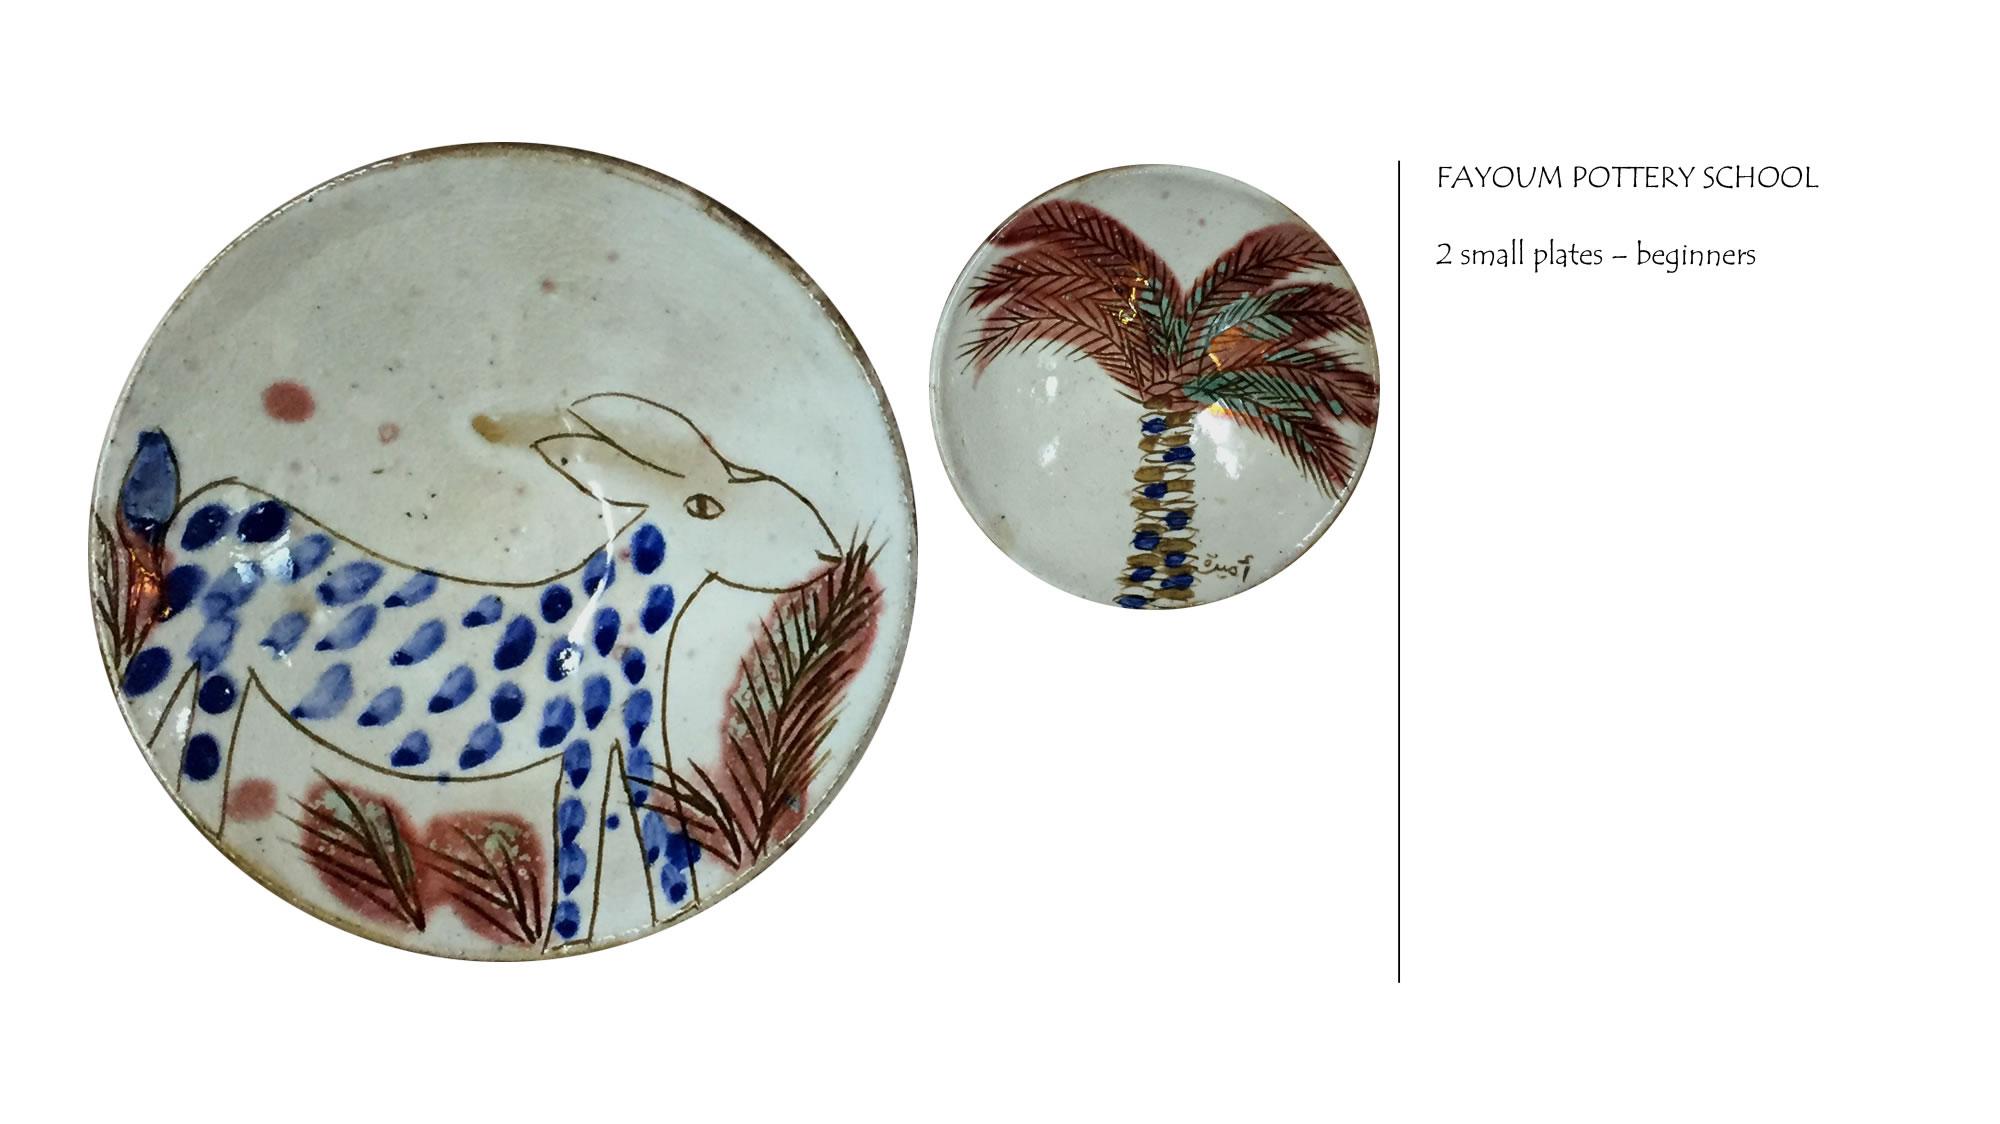 fayoum-pottery-school-04.jpg